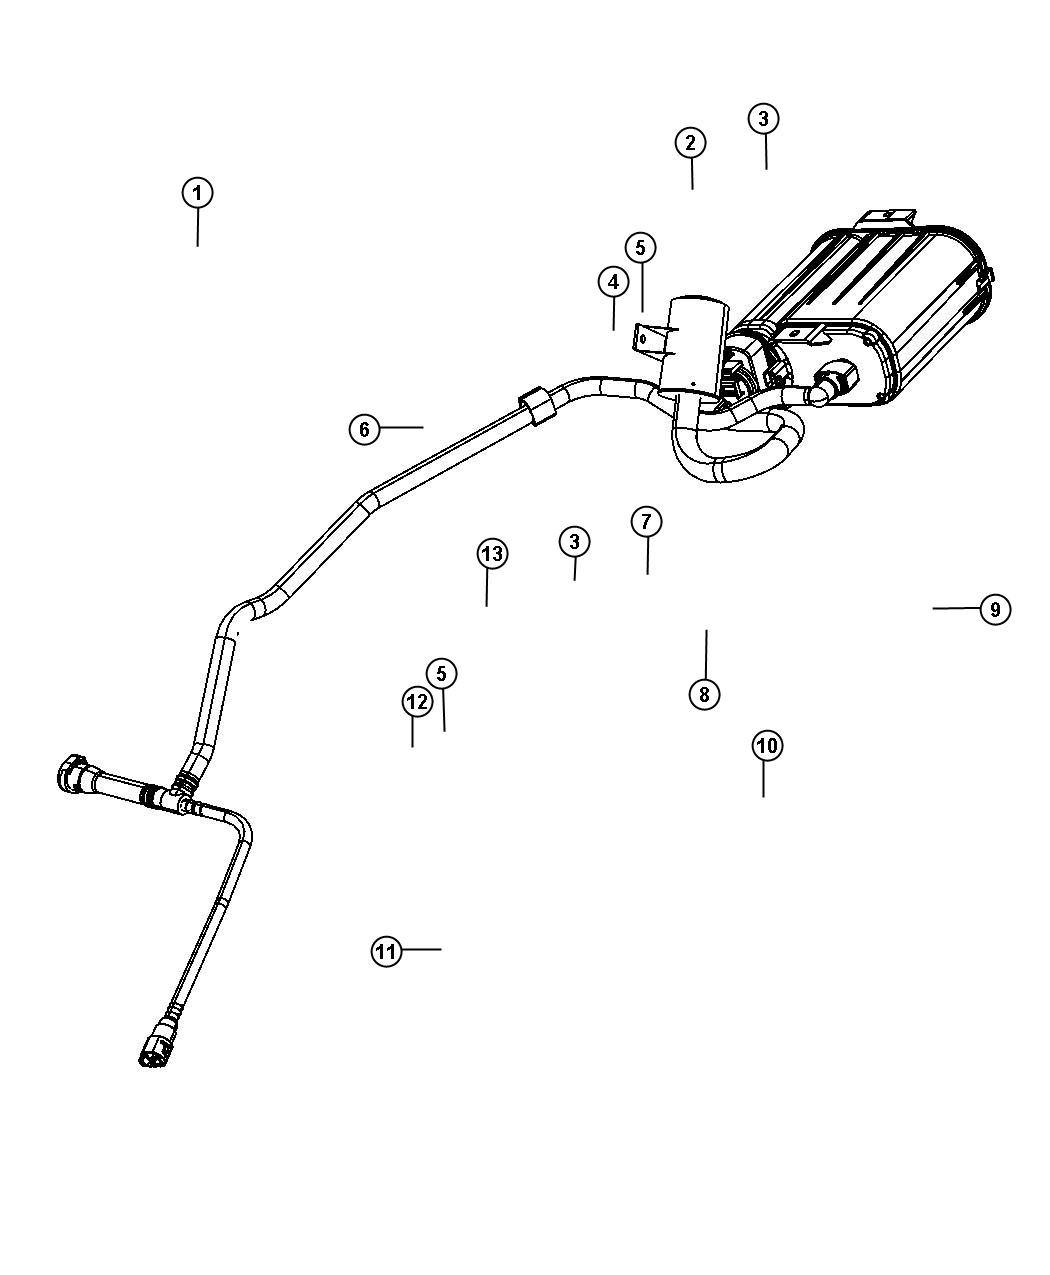 2012 Dodge Avenger Vapor Canister and Leak Detection Pump.